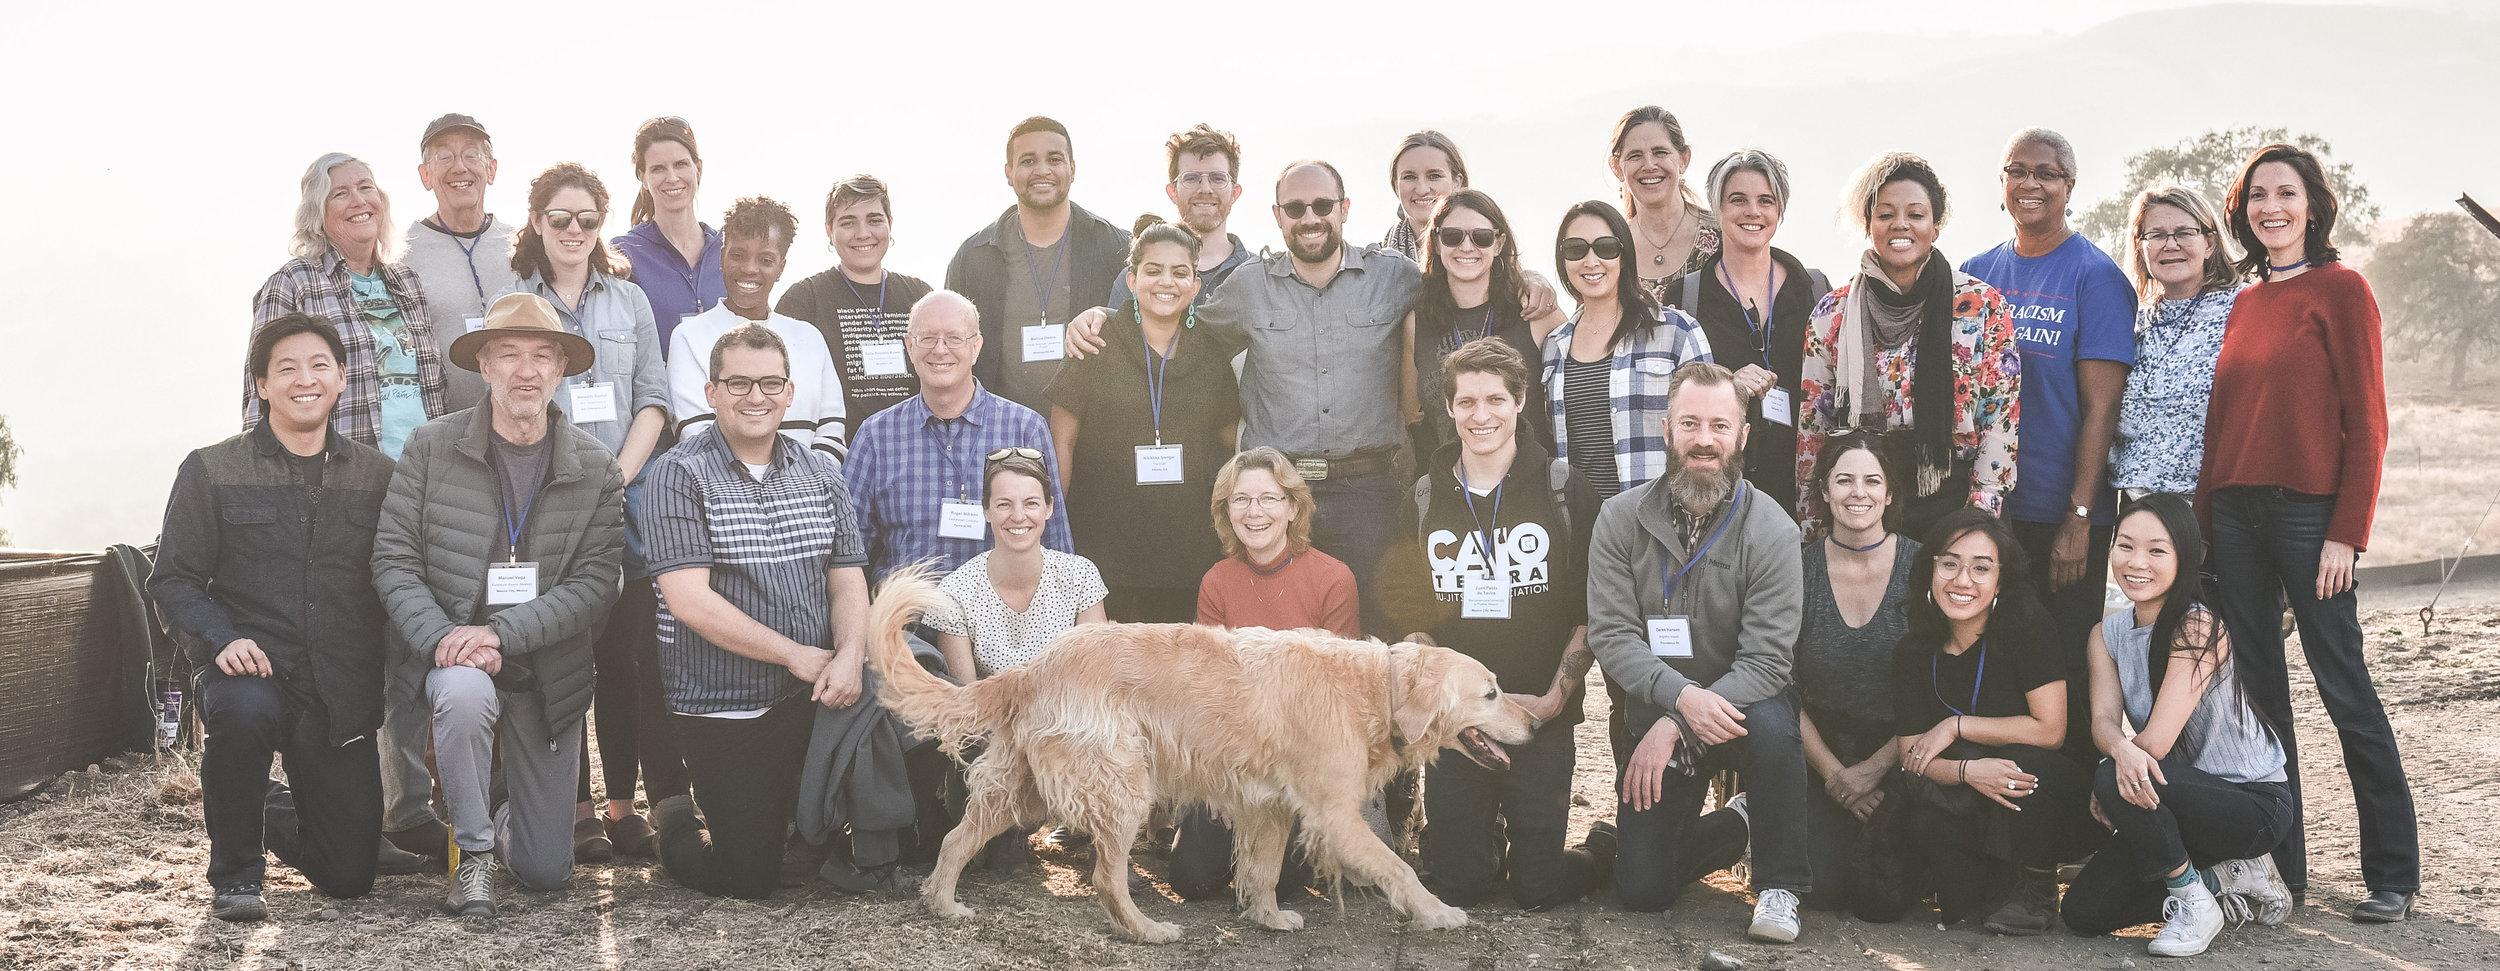 ICI 2018-19 Cohort - photo credit: Alicia Arcidiacono